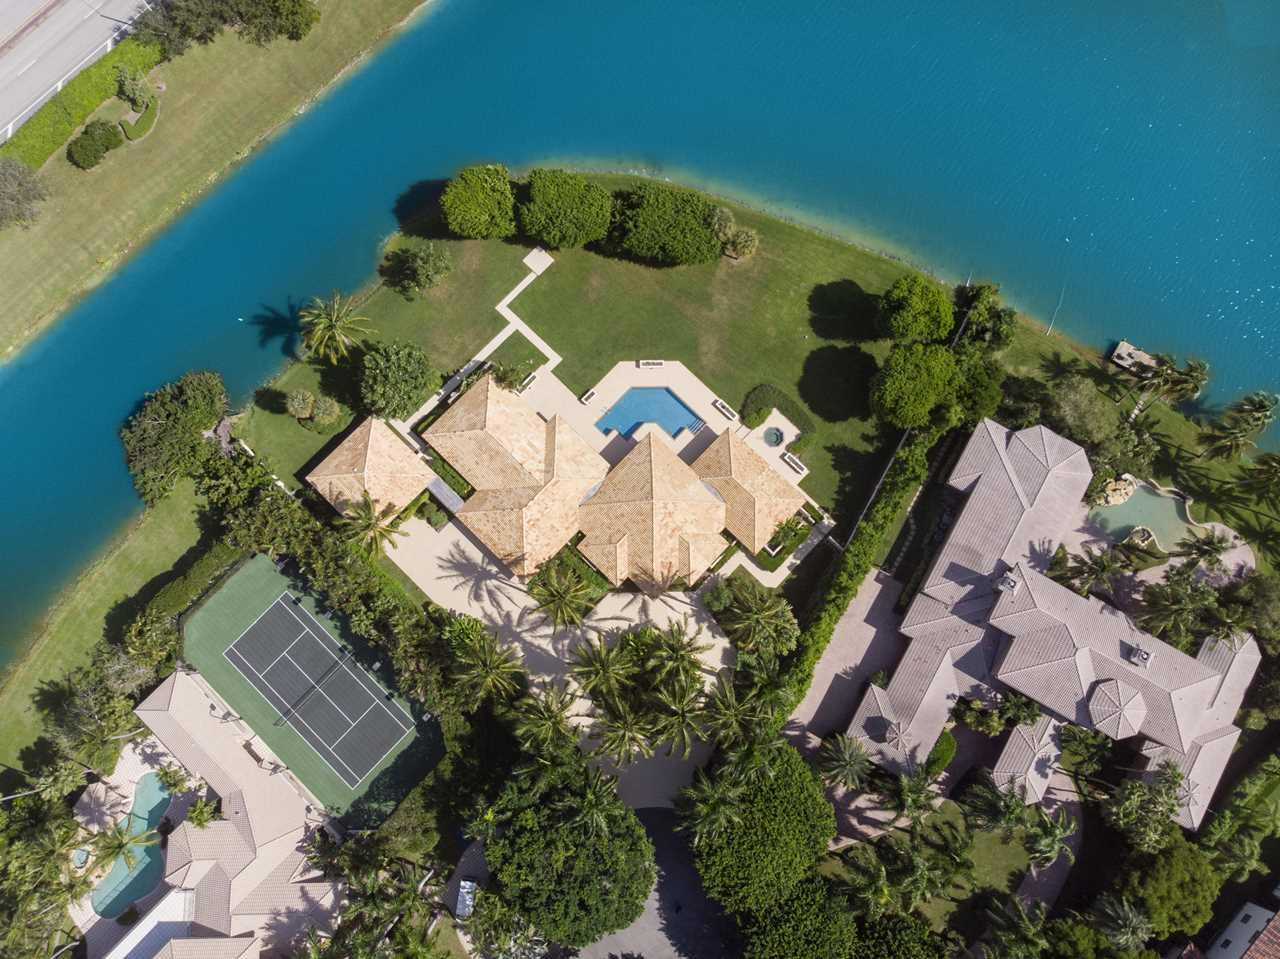 18799 Long Lake Drive Boca Raton, FL 33496 - MLS# RX-10478411 | BocaRatonRealEstate.com Photo 1